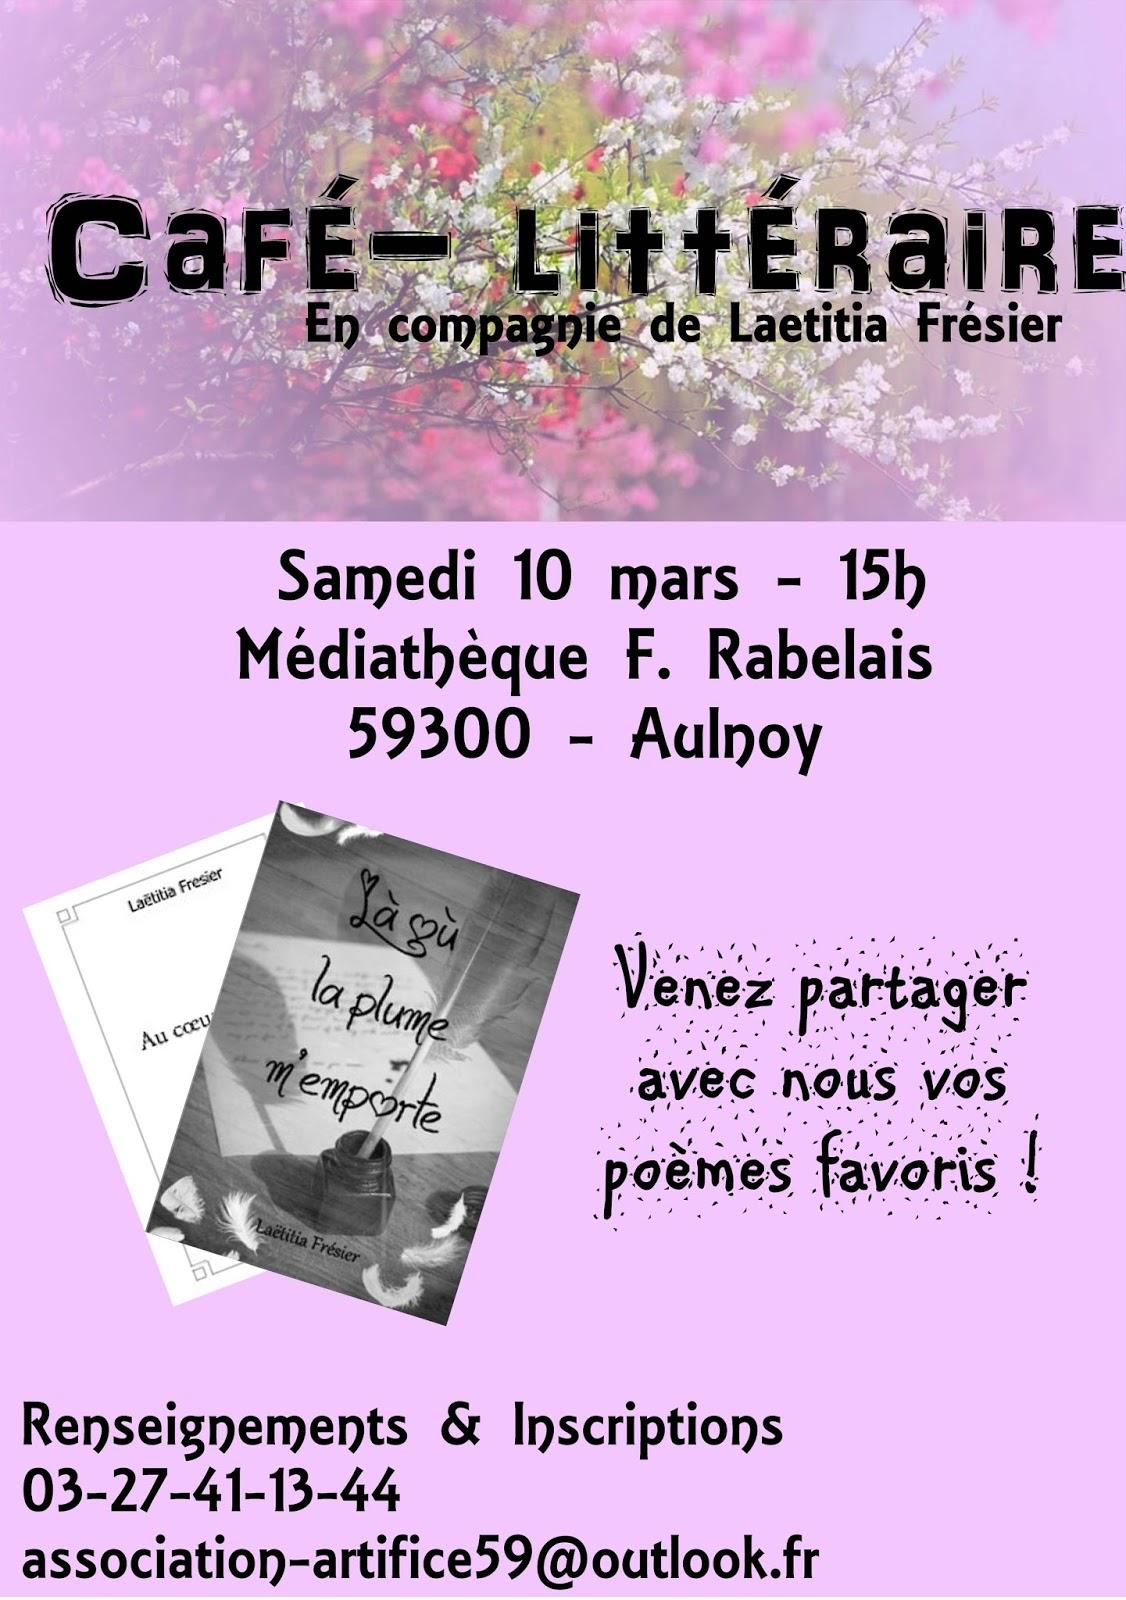 Cafe Litteraire Valenciennes  F Ef Bf Bdvrier